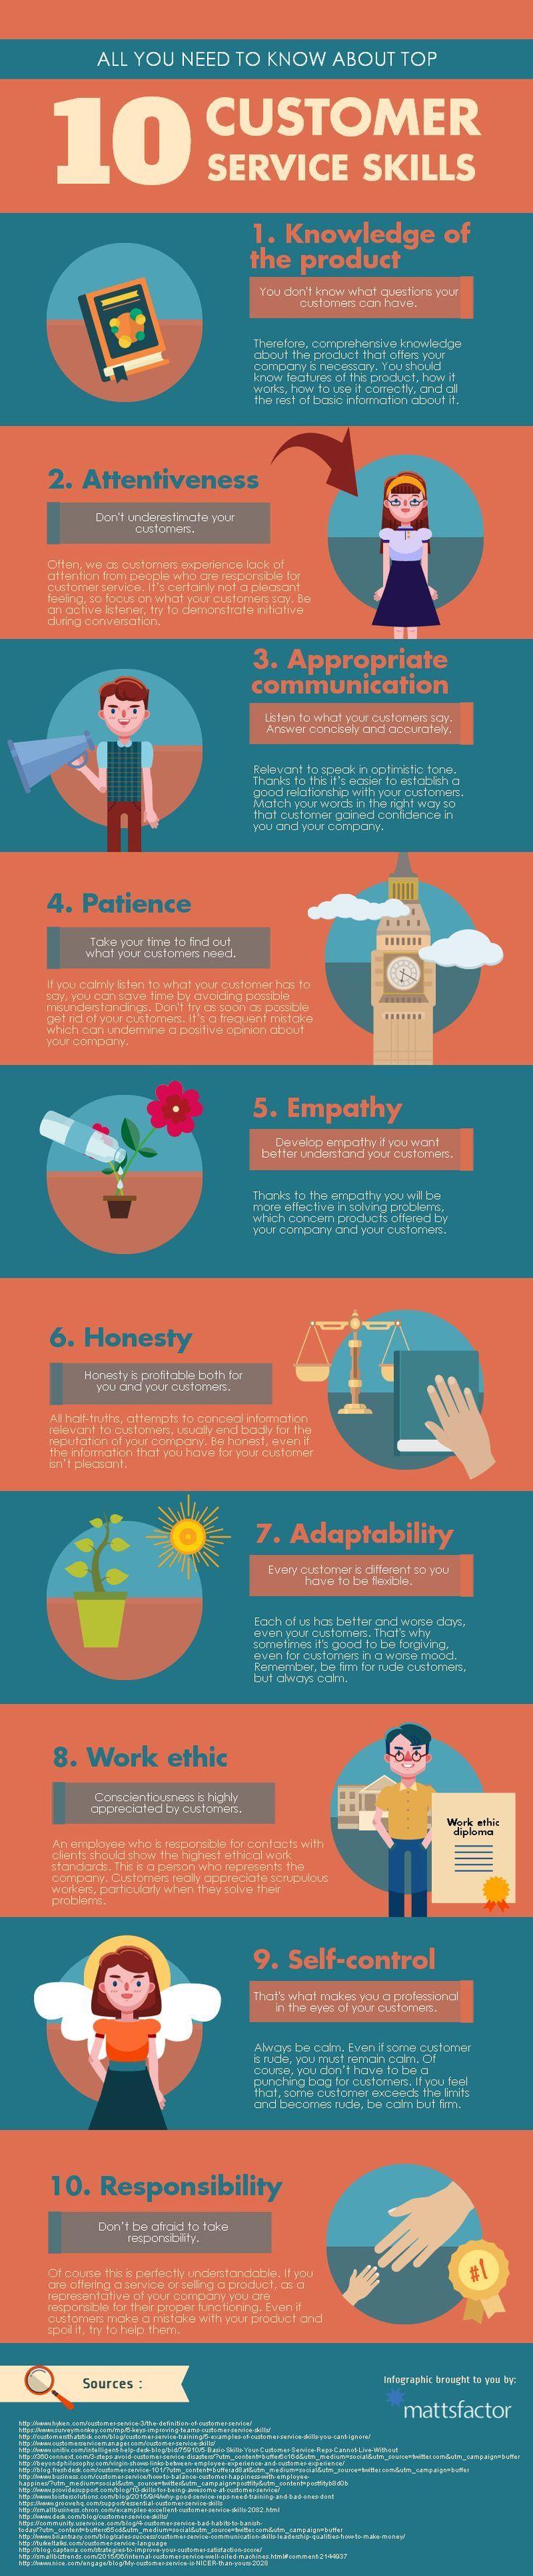 3 most important customer service skills